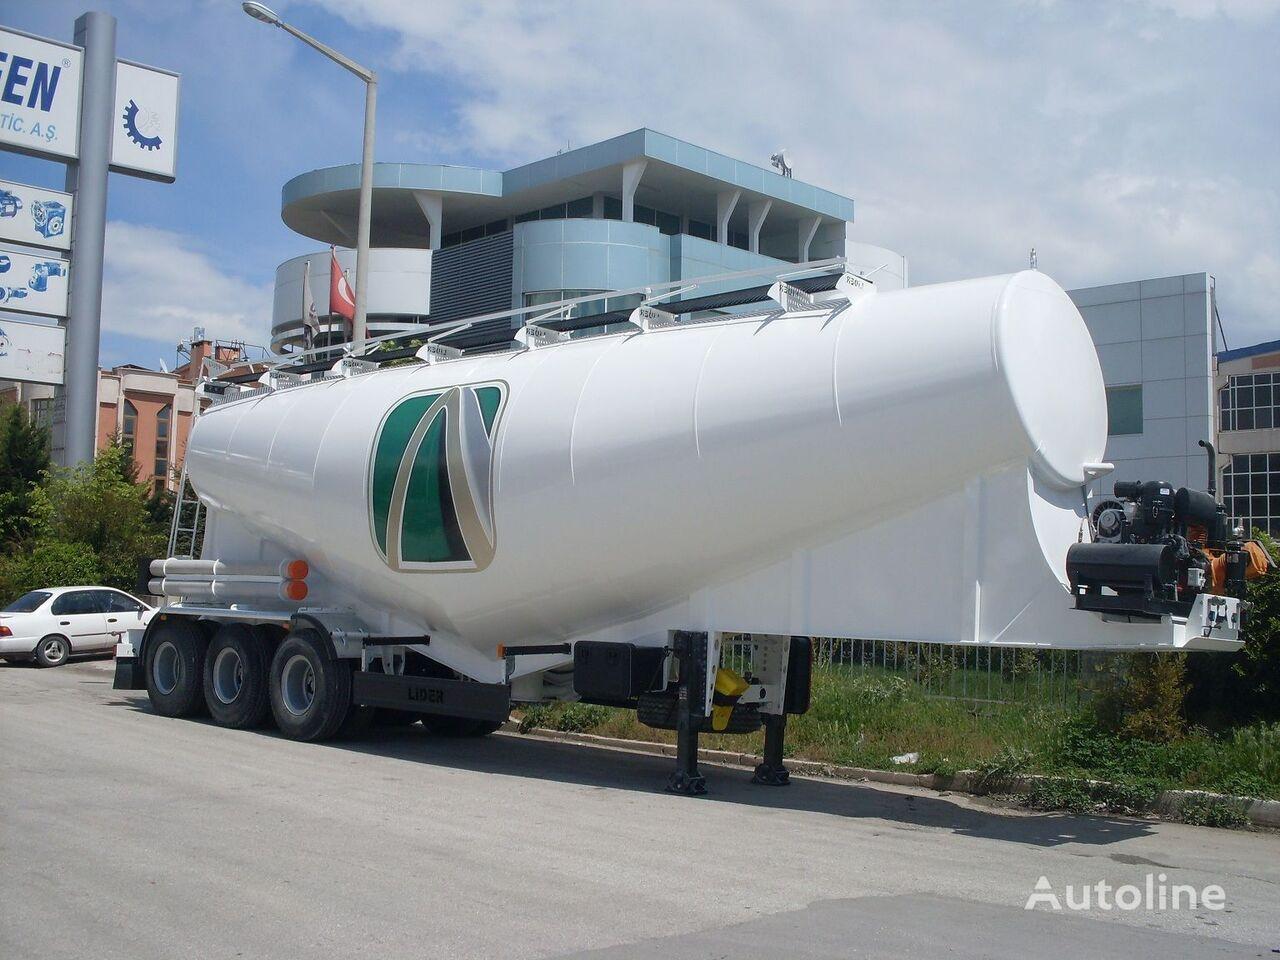 LIDER بلكر اسمنت مواصفات اوربية 2018 cisterna de cemento nueva